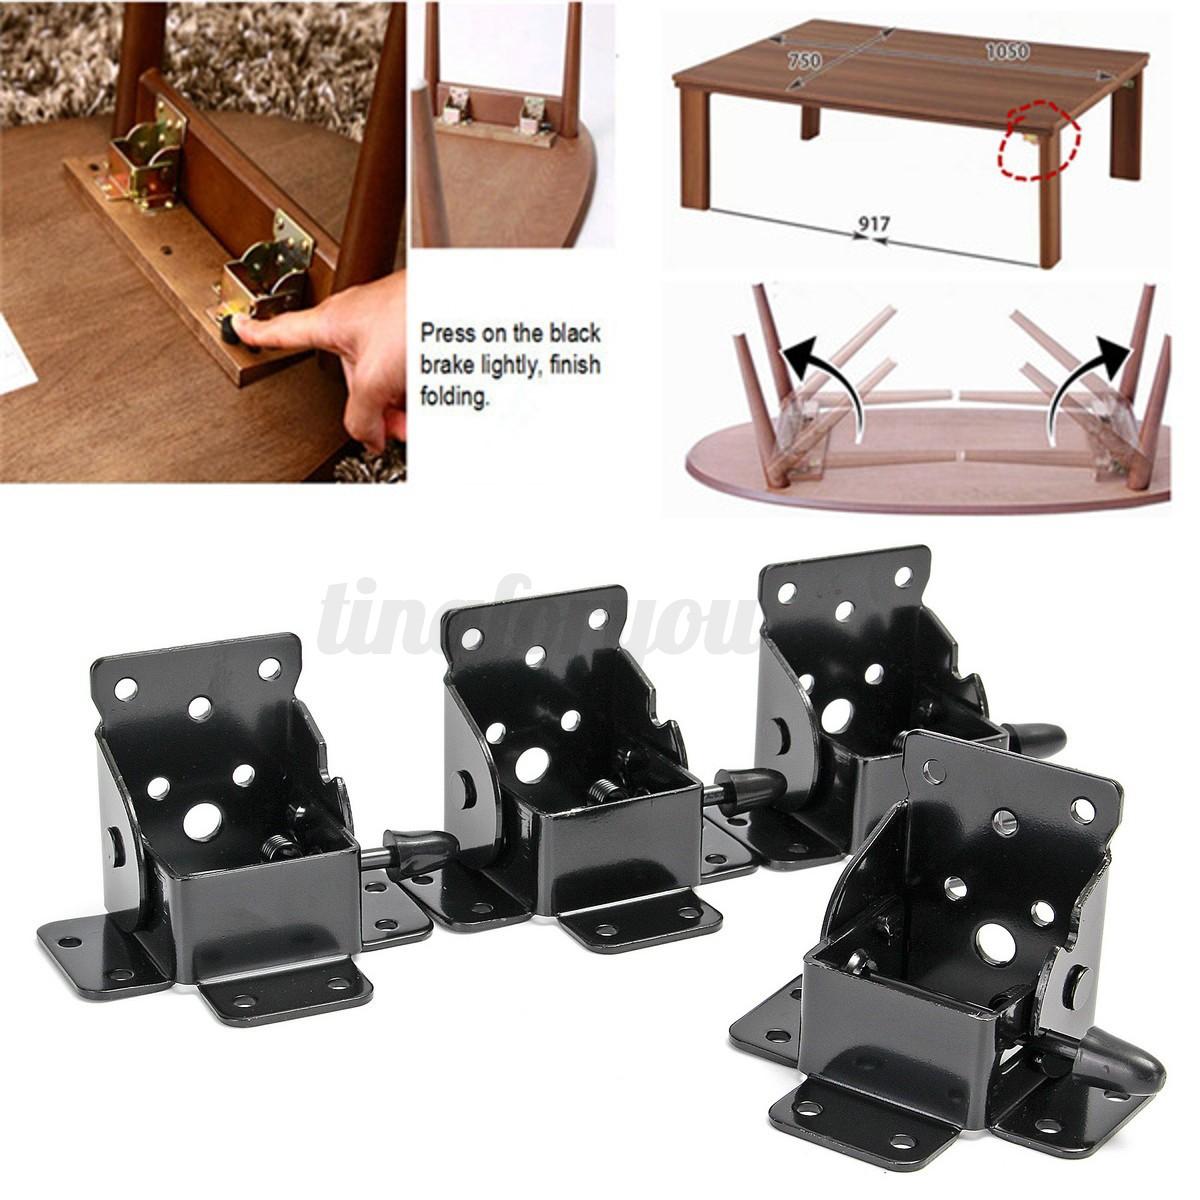 4pcs set 4 types diy self locking folding bracket folding table leg feet hinges ebay. Black Bedroom Furniture Sets. Home Design Ideas